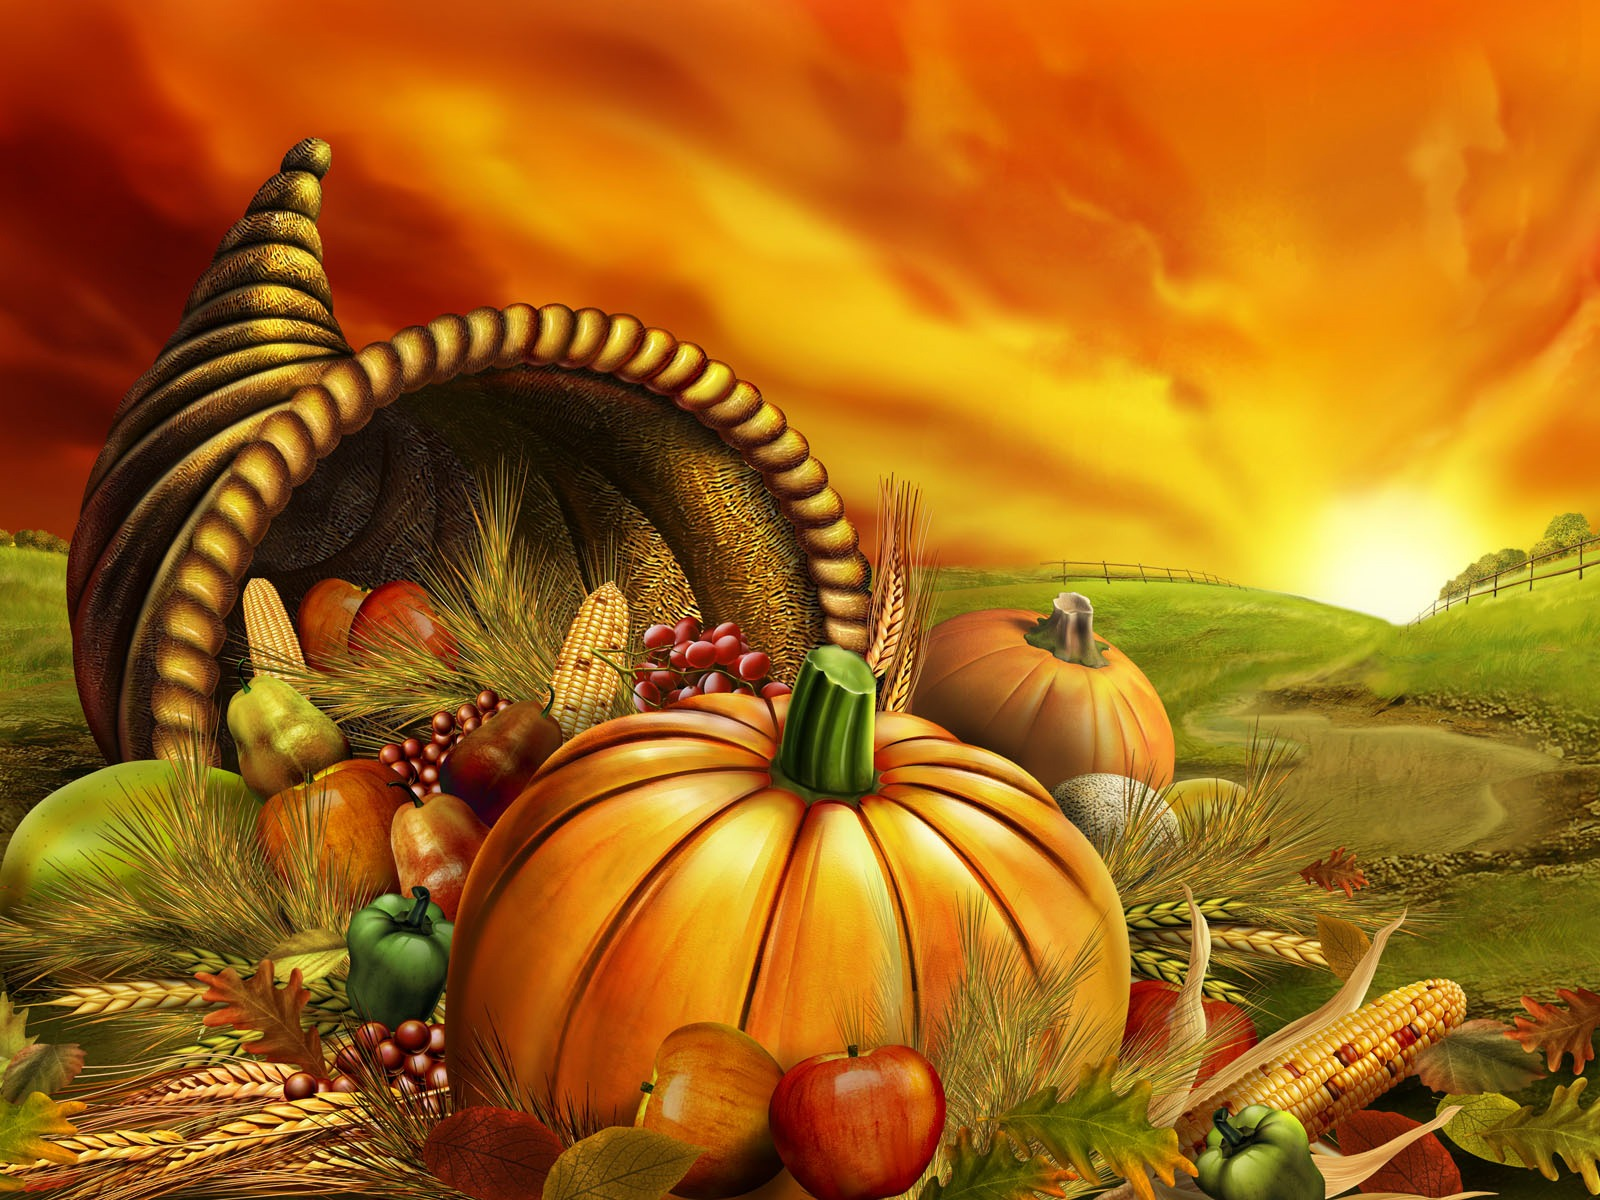 Thanksgiving Desktop wallpapers backgrounds 1600x1200